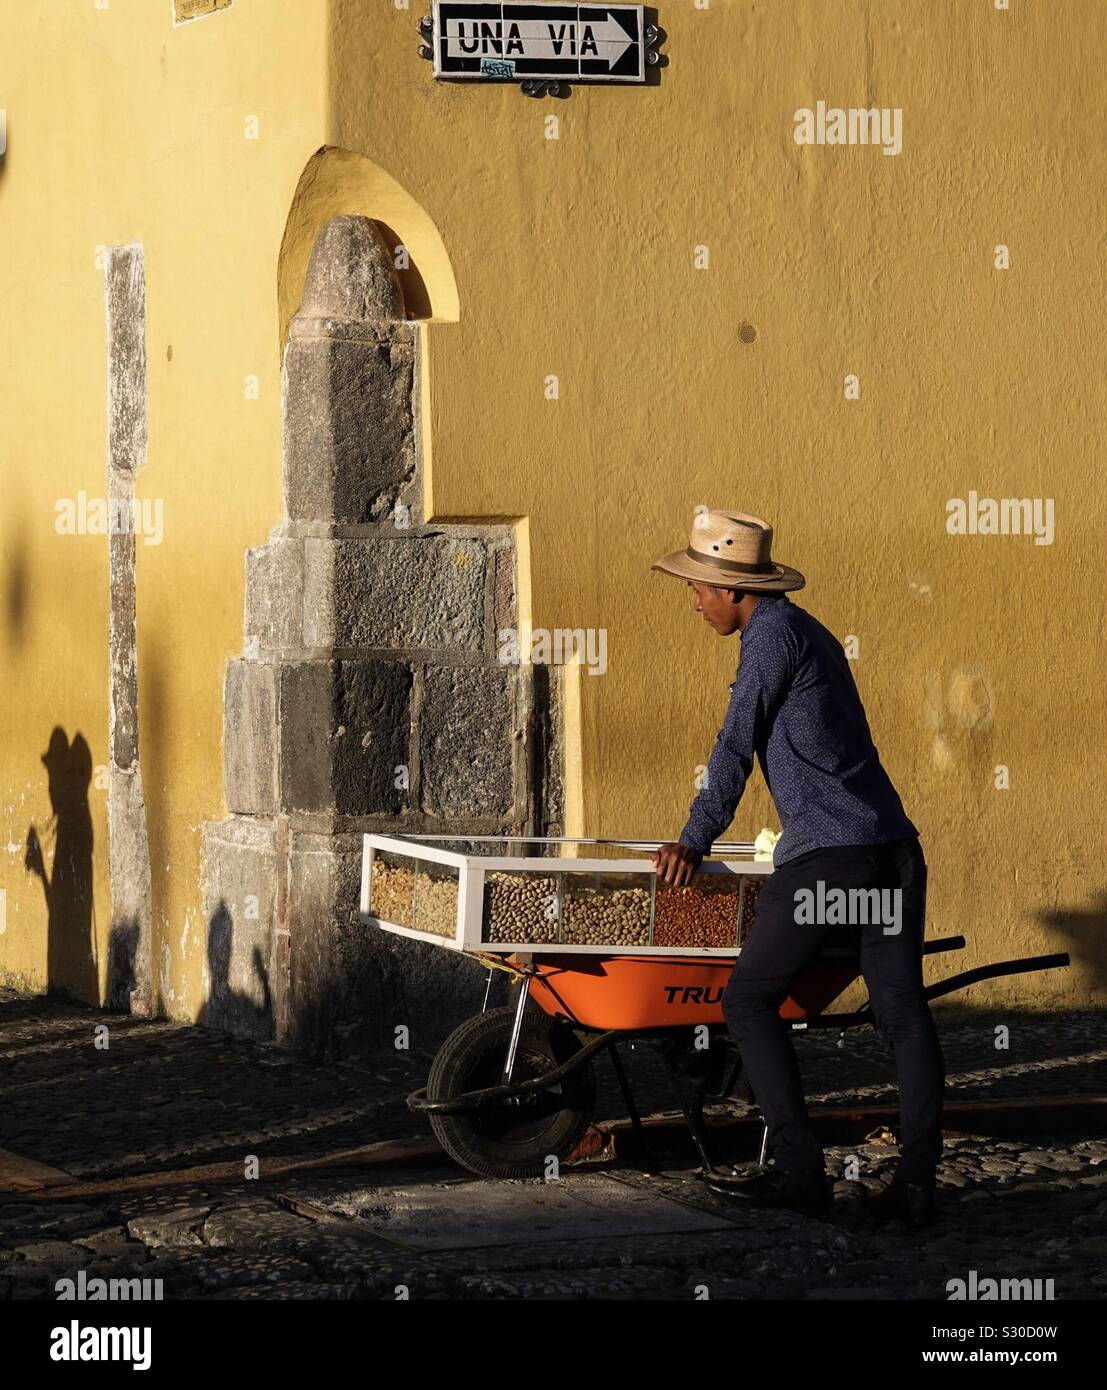 Viajar tuerca vendedores en Antigua, Guatemala Foto de stock